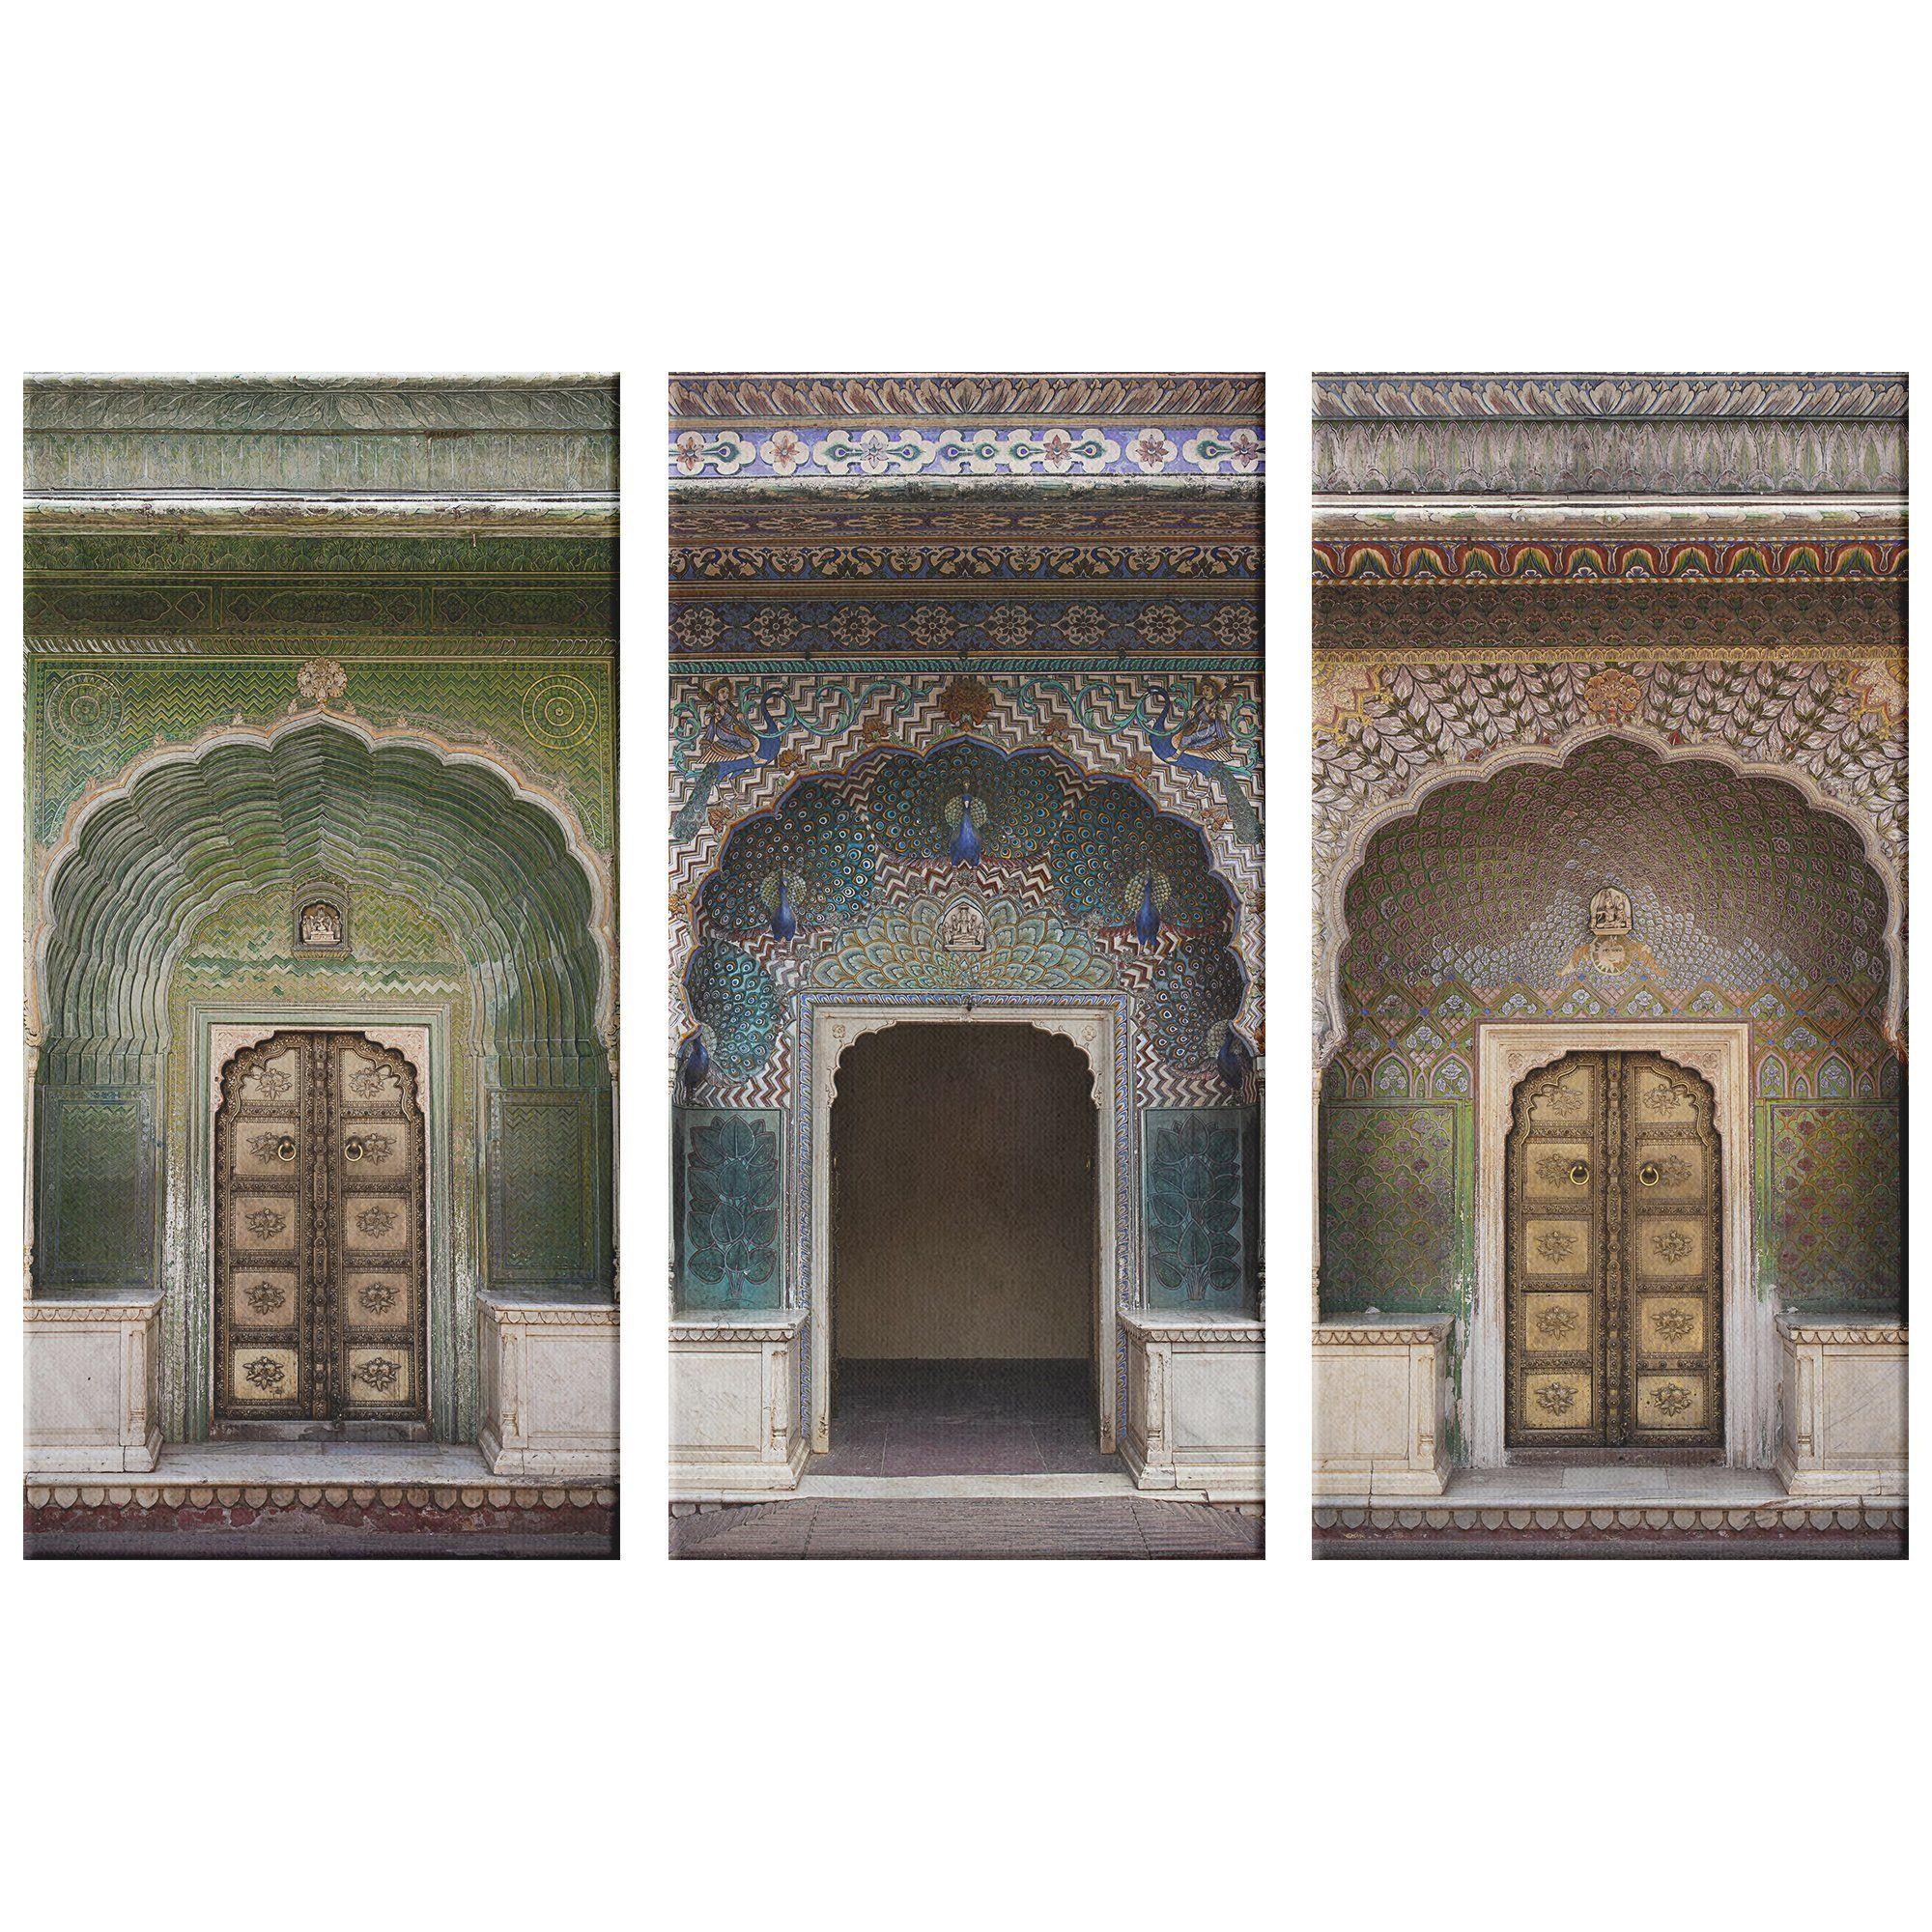 Pin On Wall Art Decor Ideas Inspirations